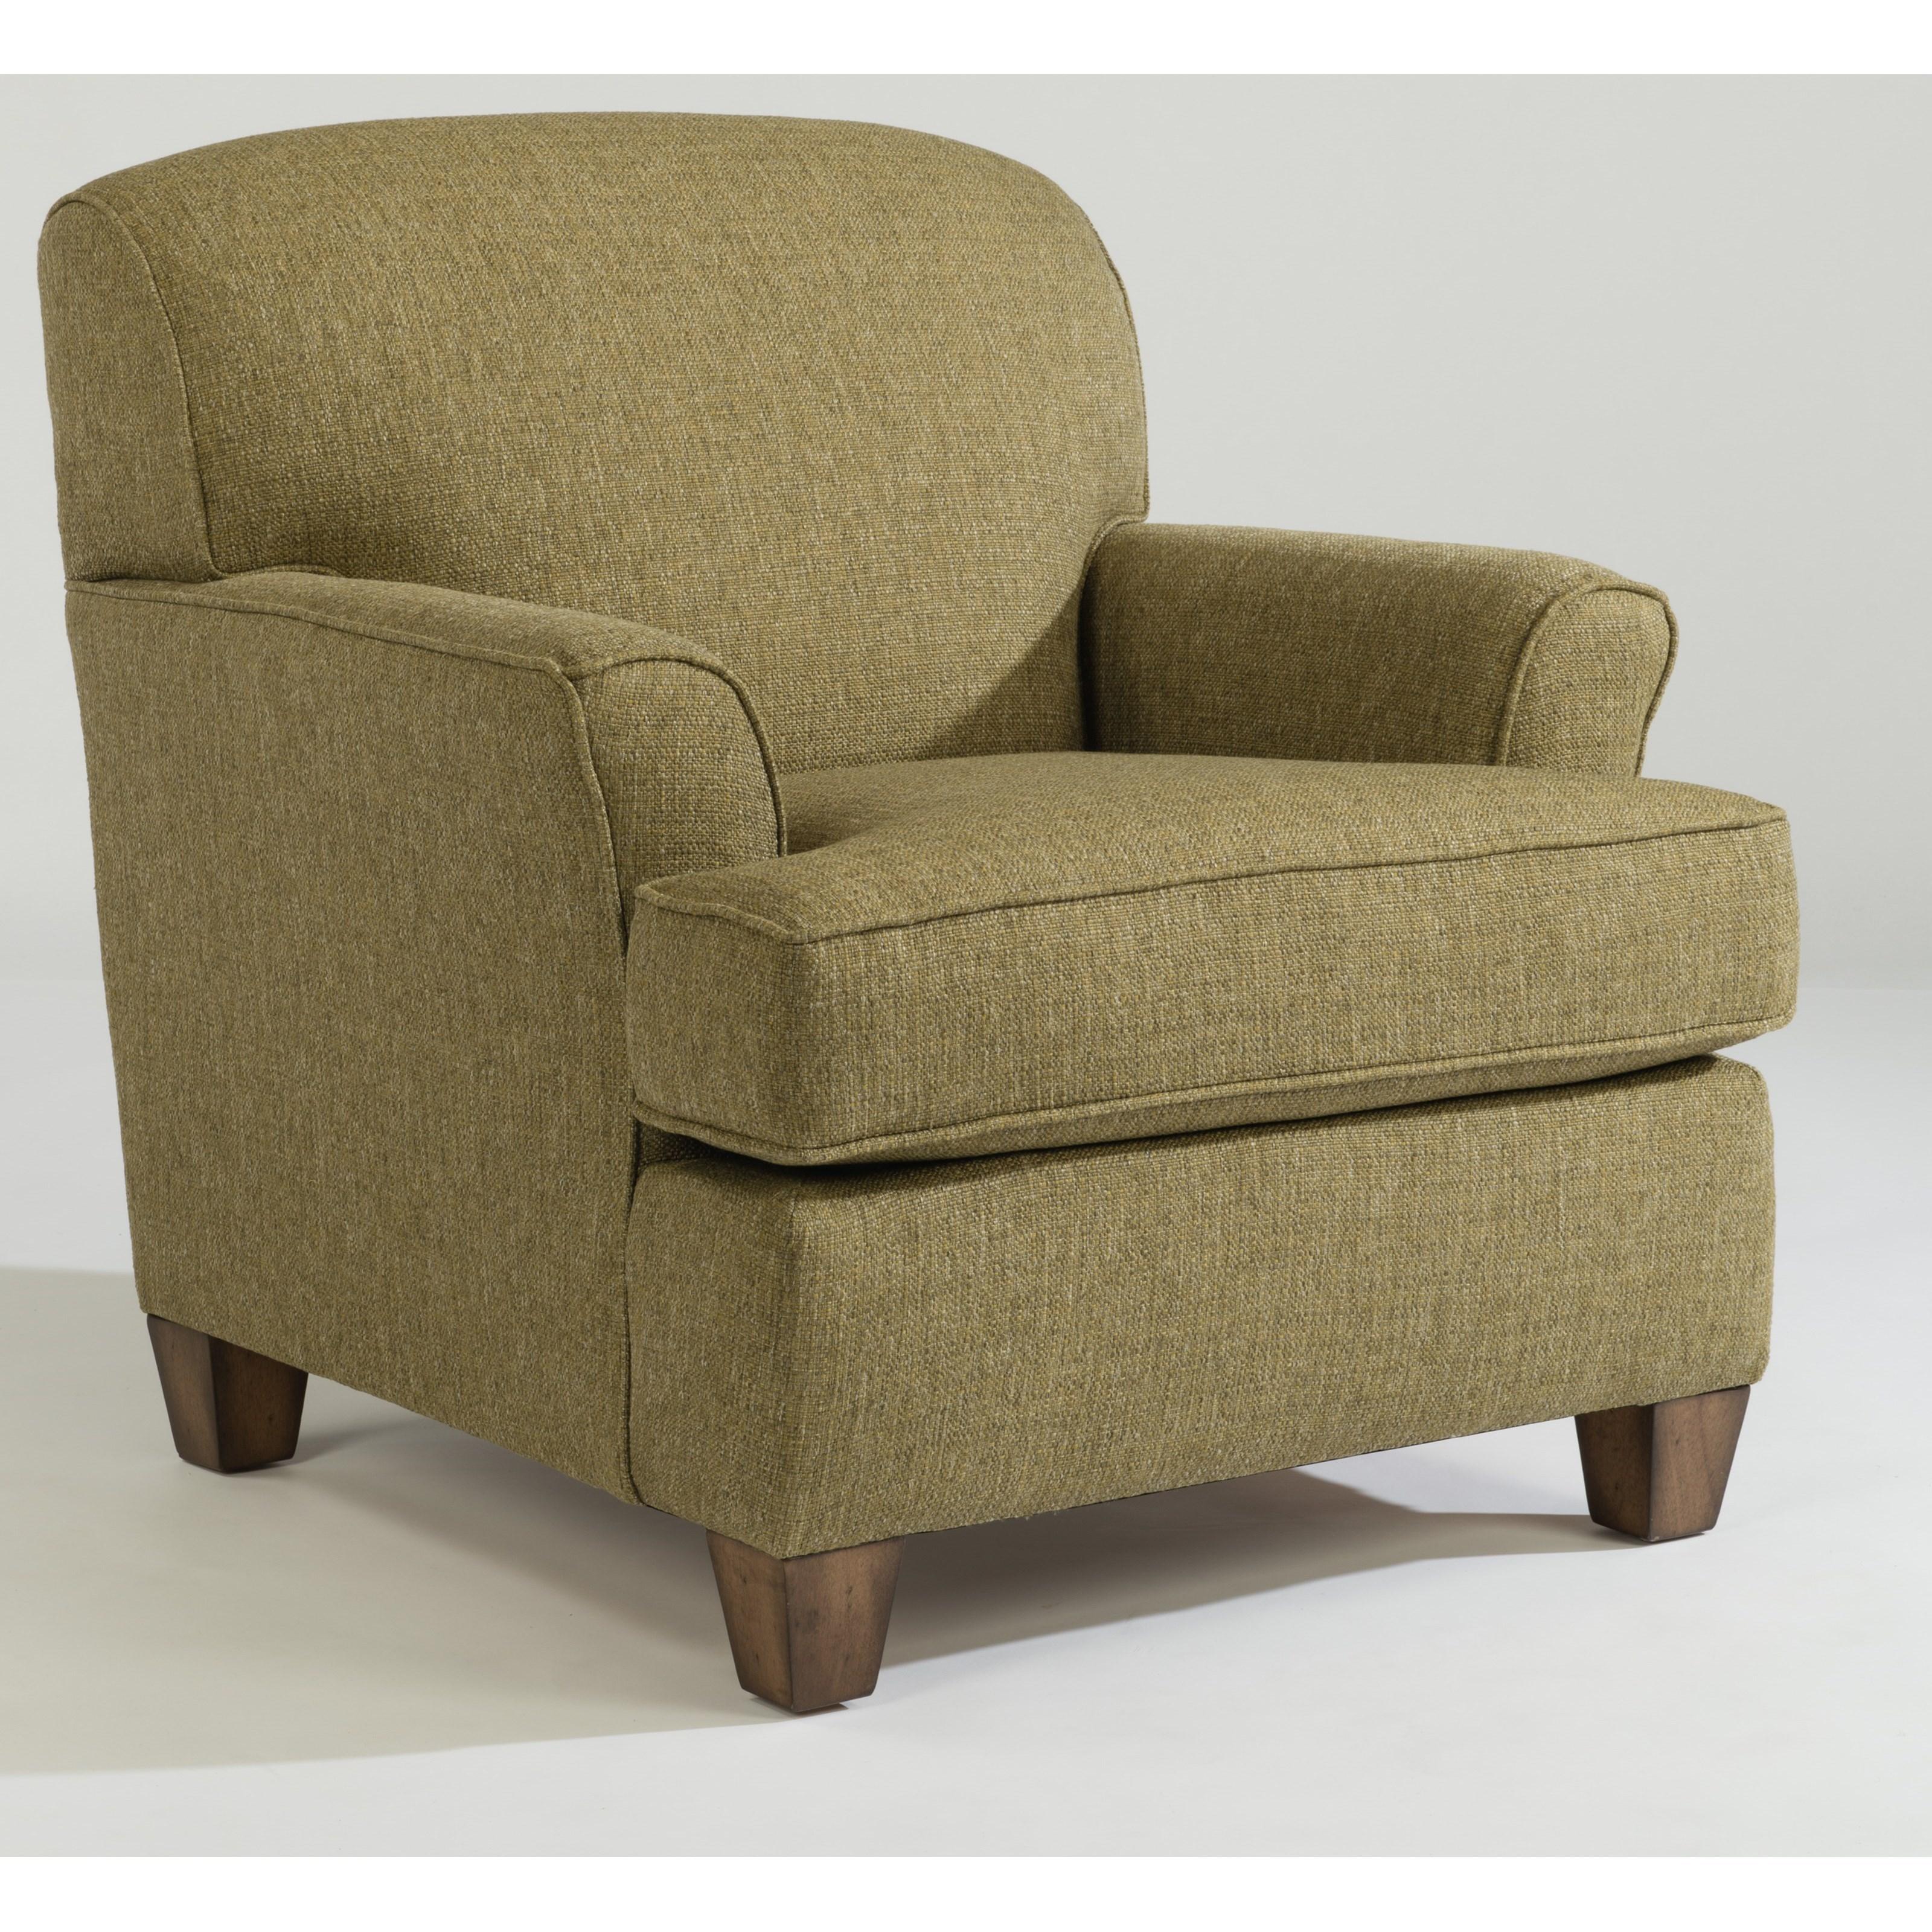 Flexsteel Atlantis Chair - Item Number: 5713-10-145-22